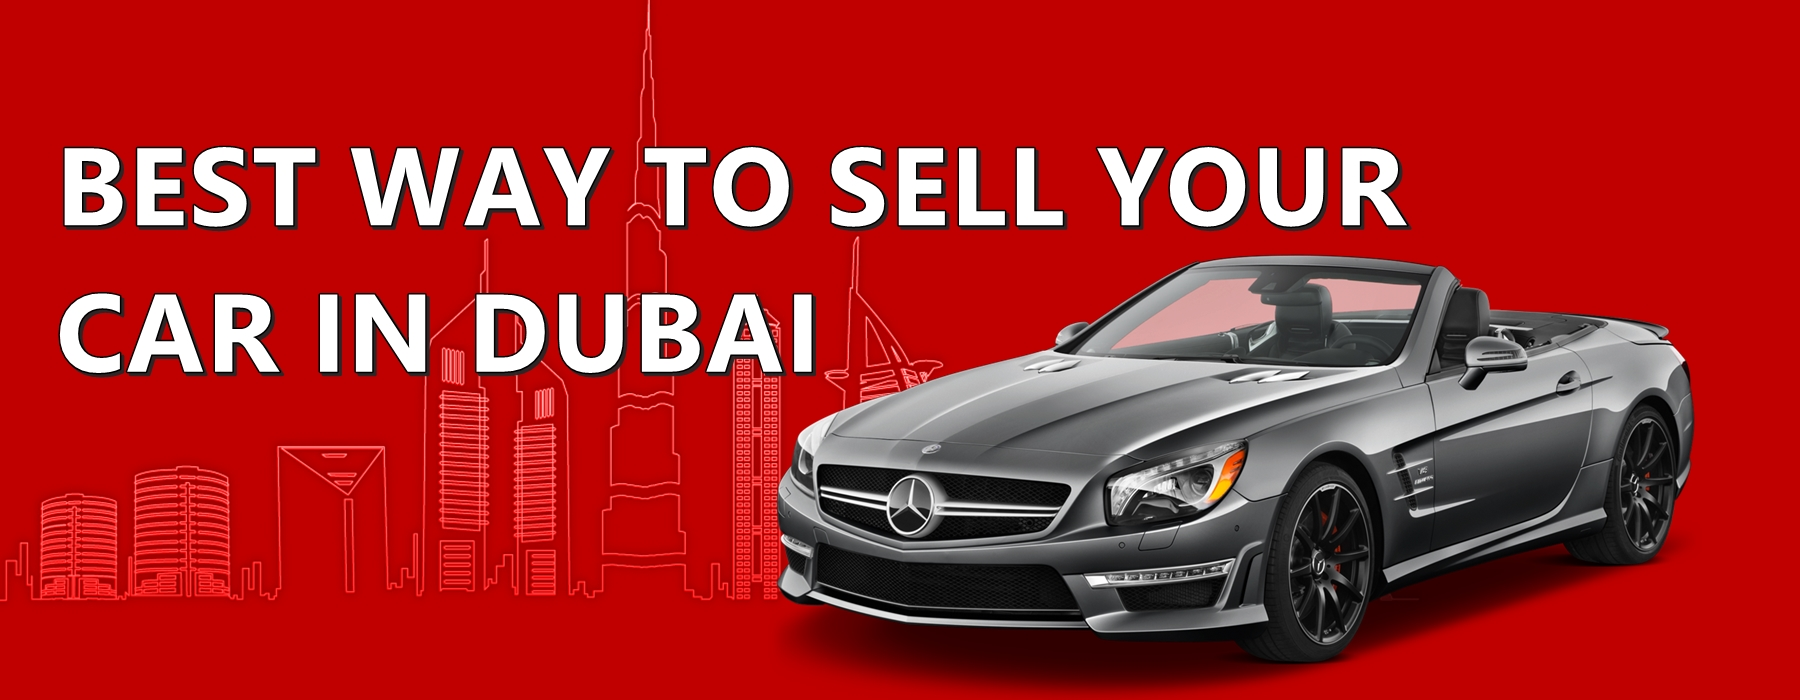 How to sell my car in Dubai - Glipee Motors